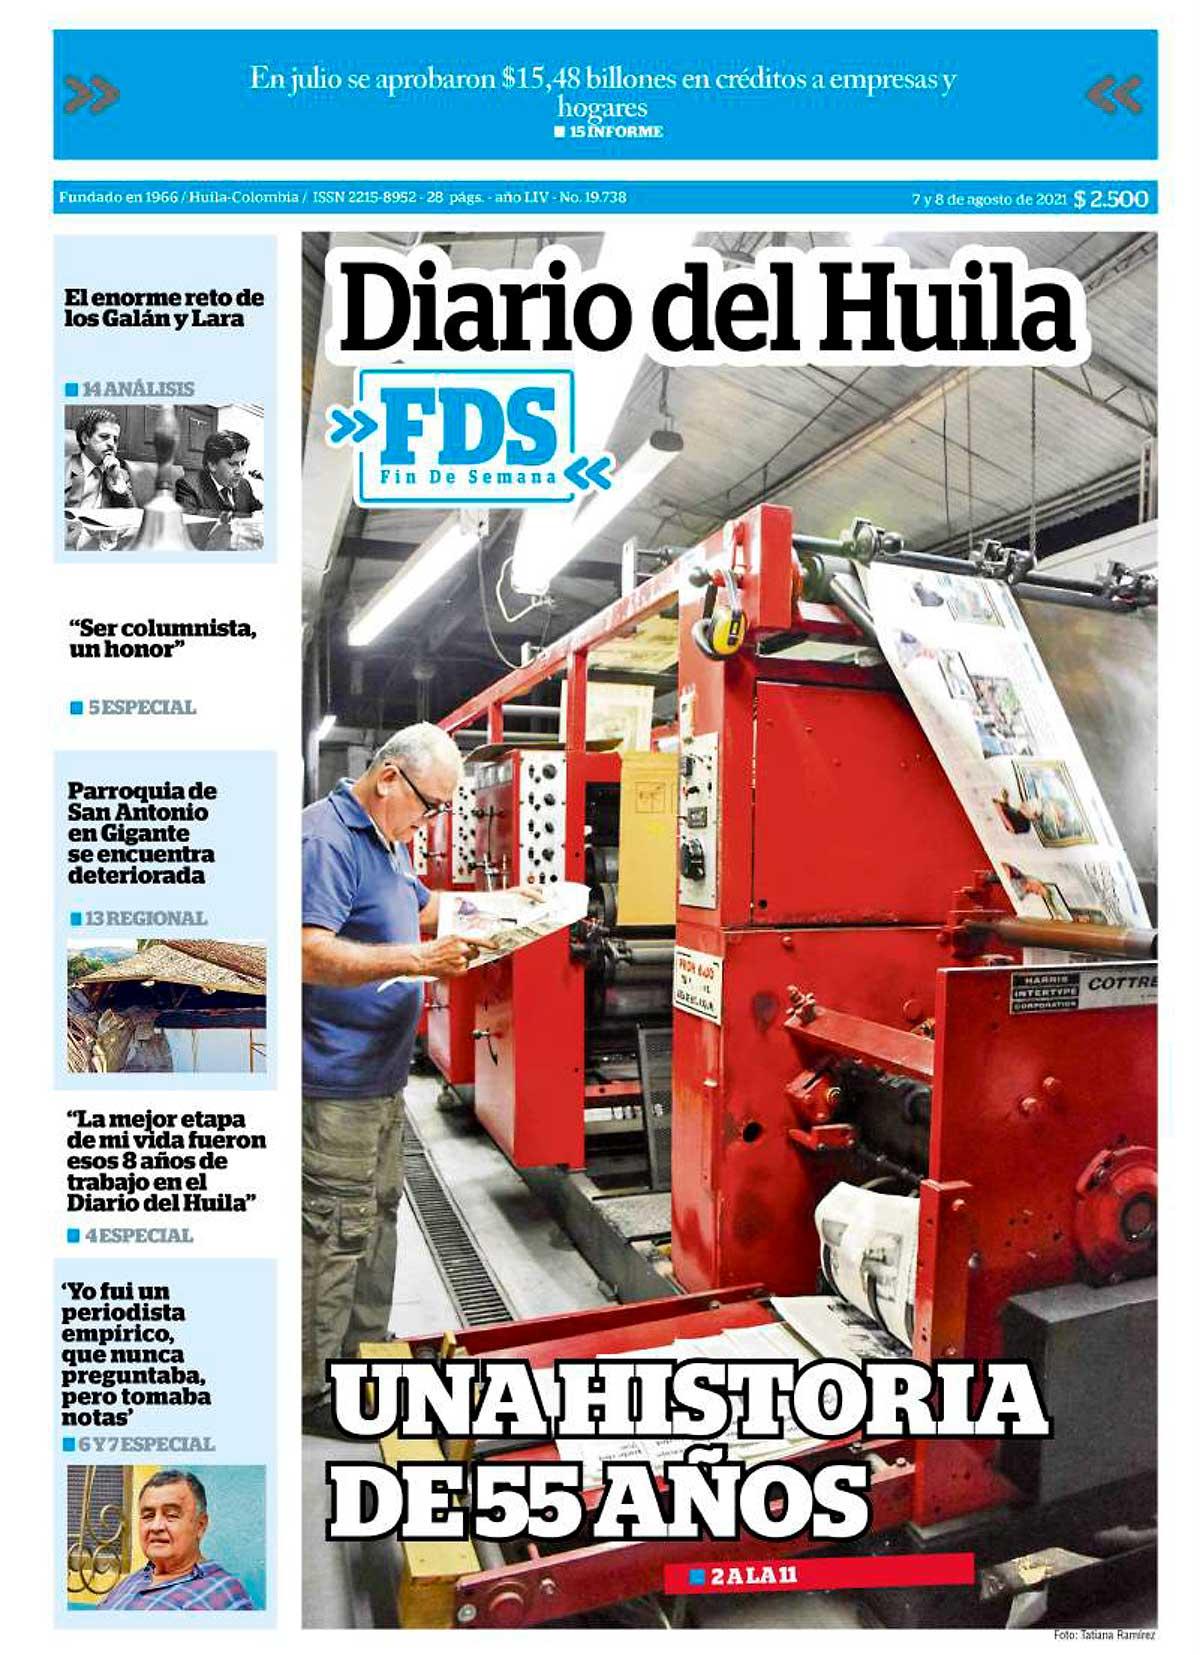 Diario del Huila Digital - GRATIS